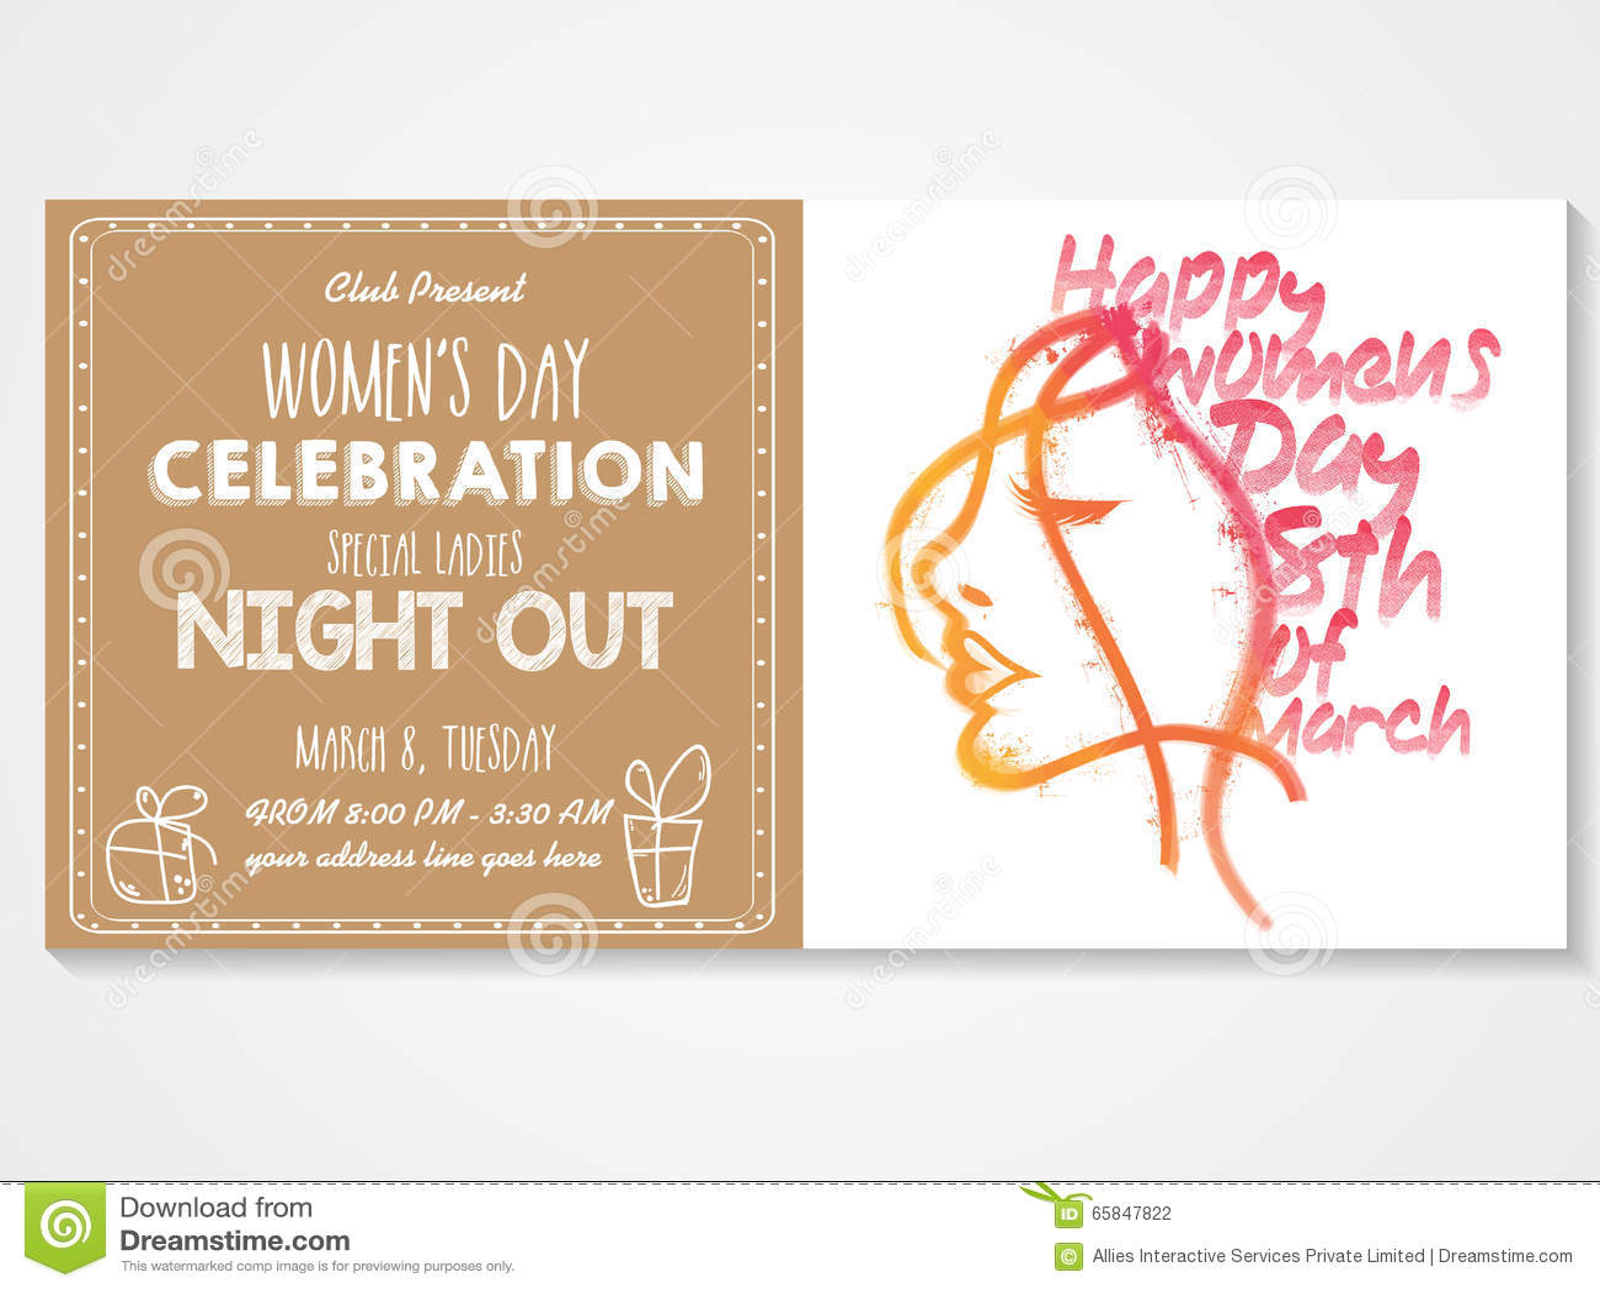 Invitation Card For Women's Day Celebration. Stock ...